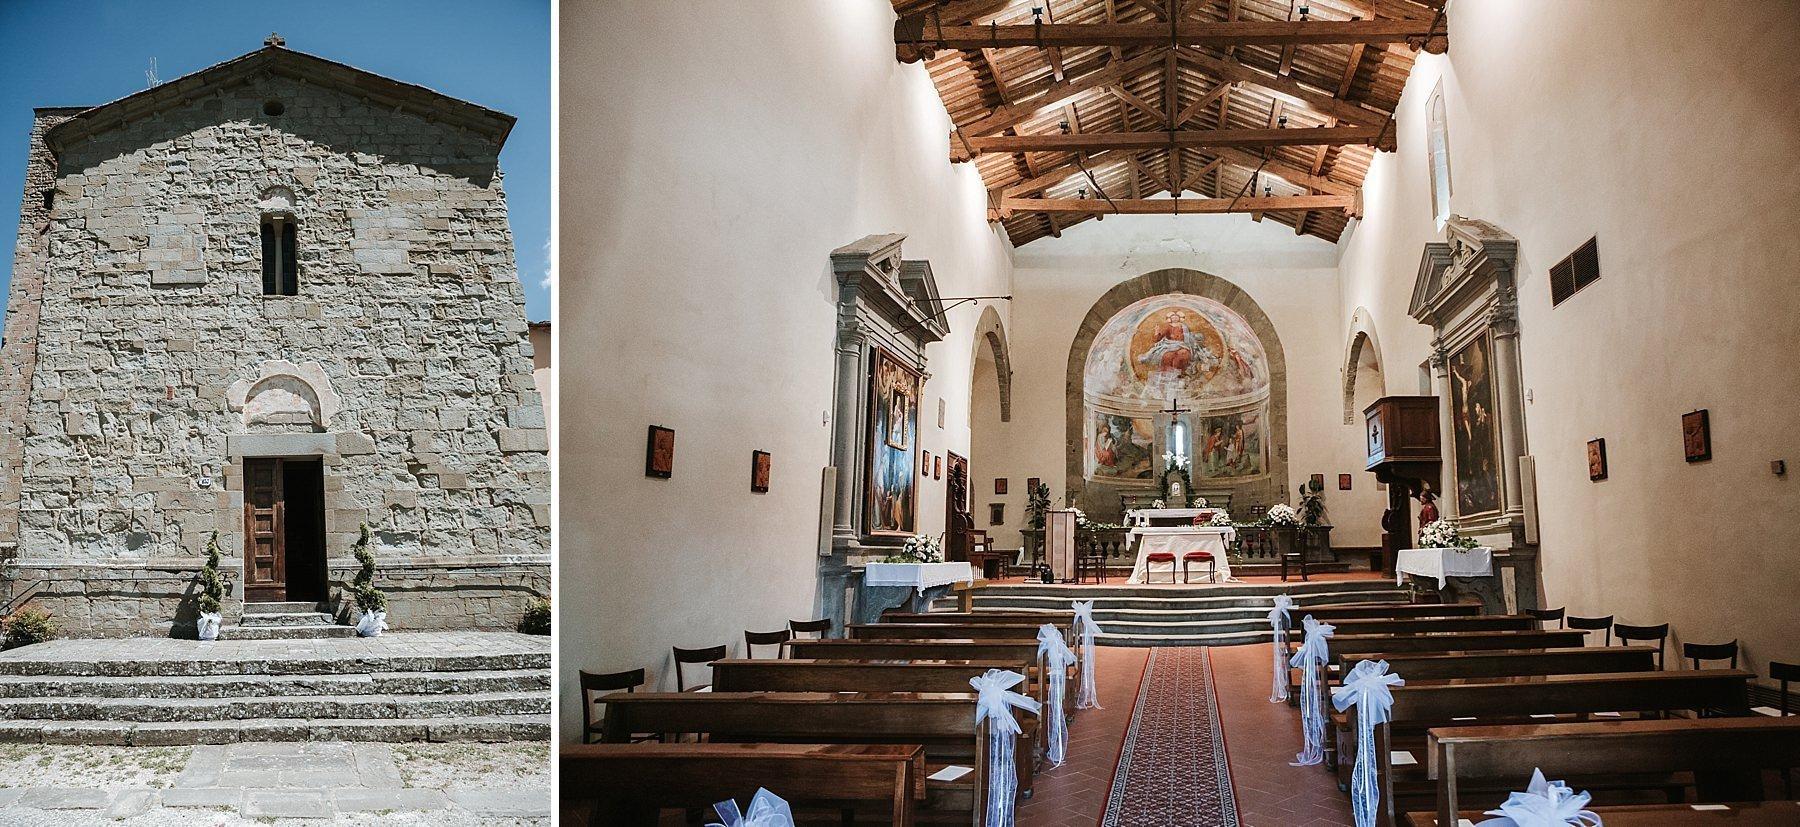 Chiesa S. Giovanni Evangelista a Valdibure Pistoia